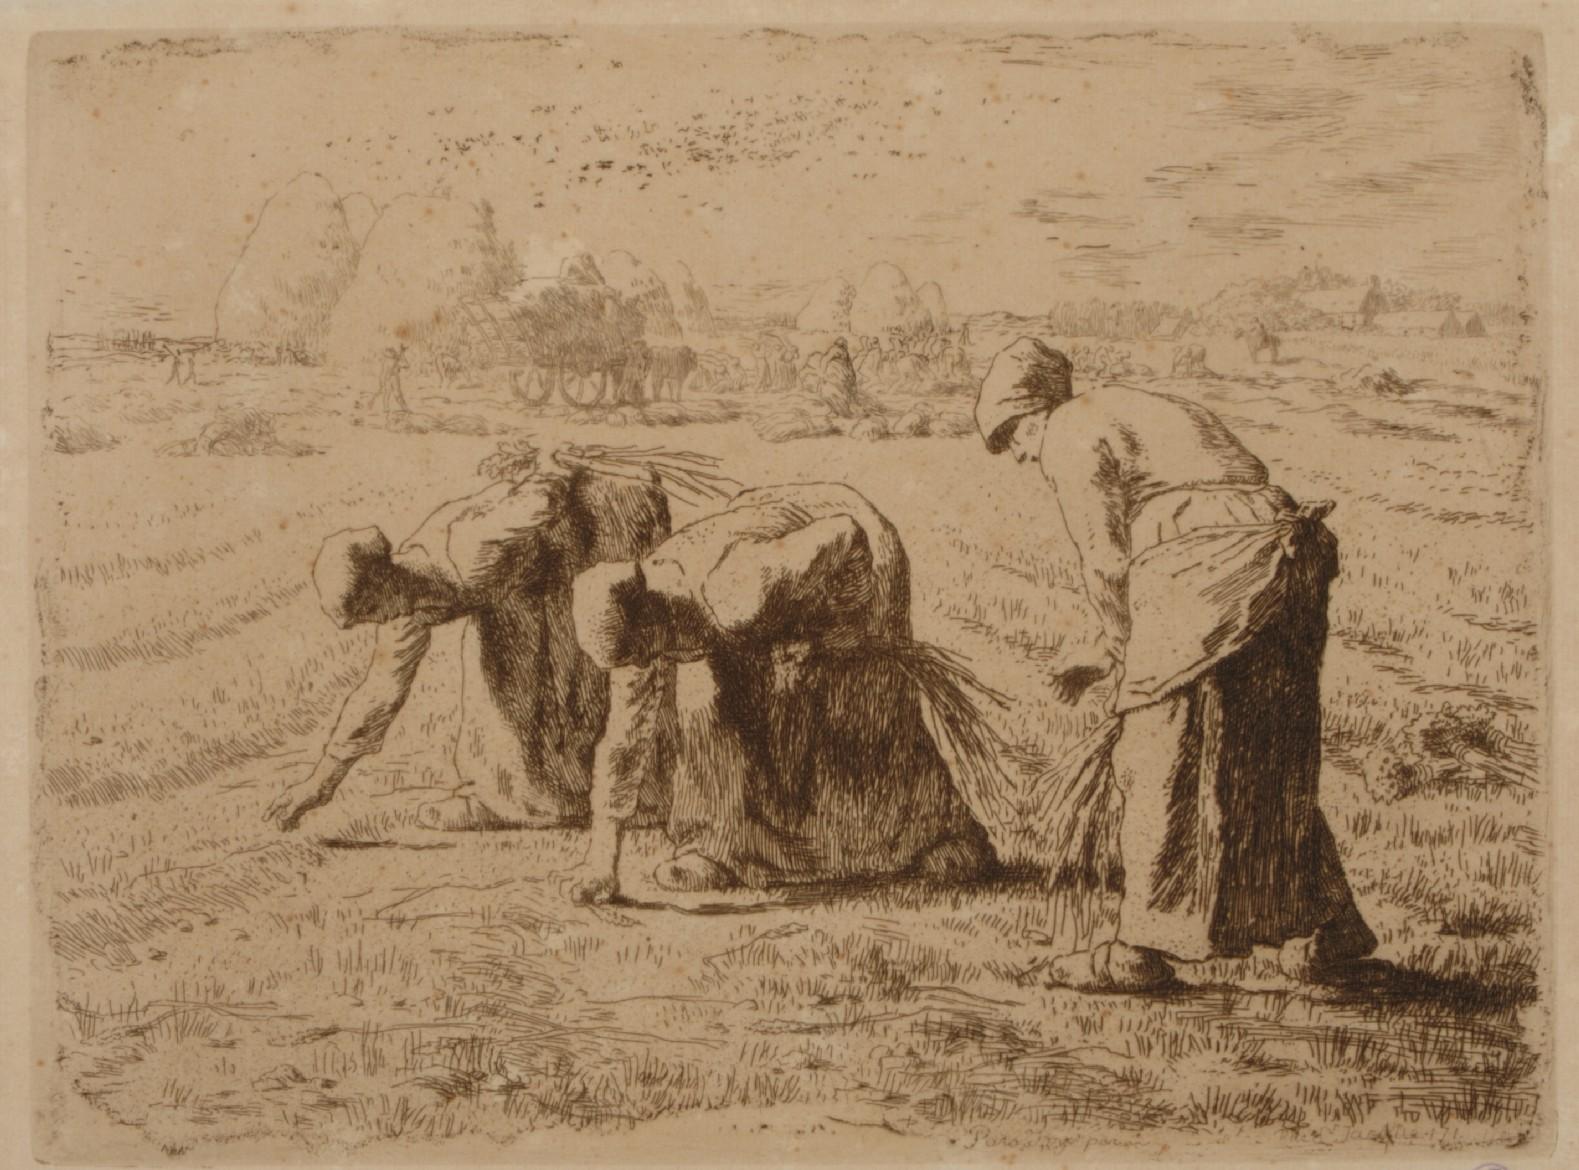 Artist Millet